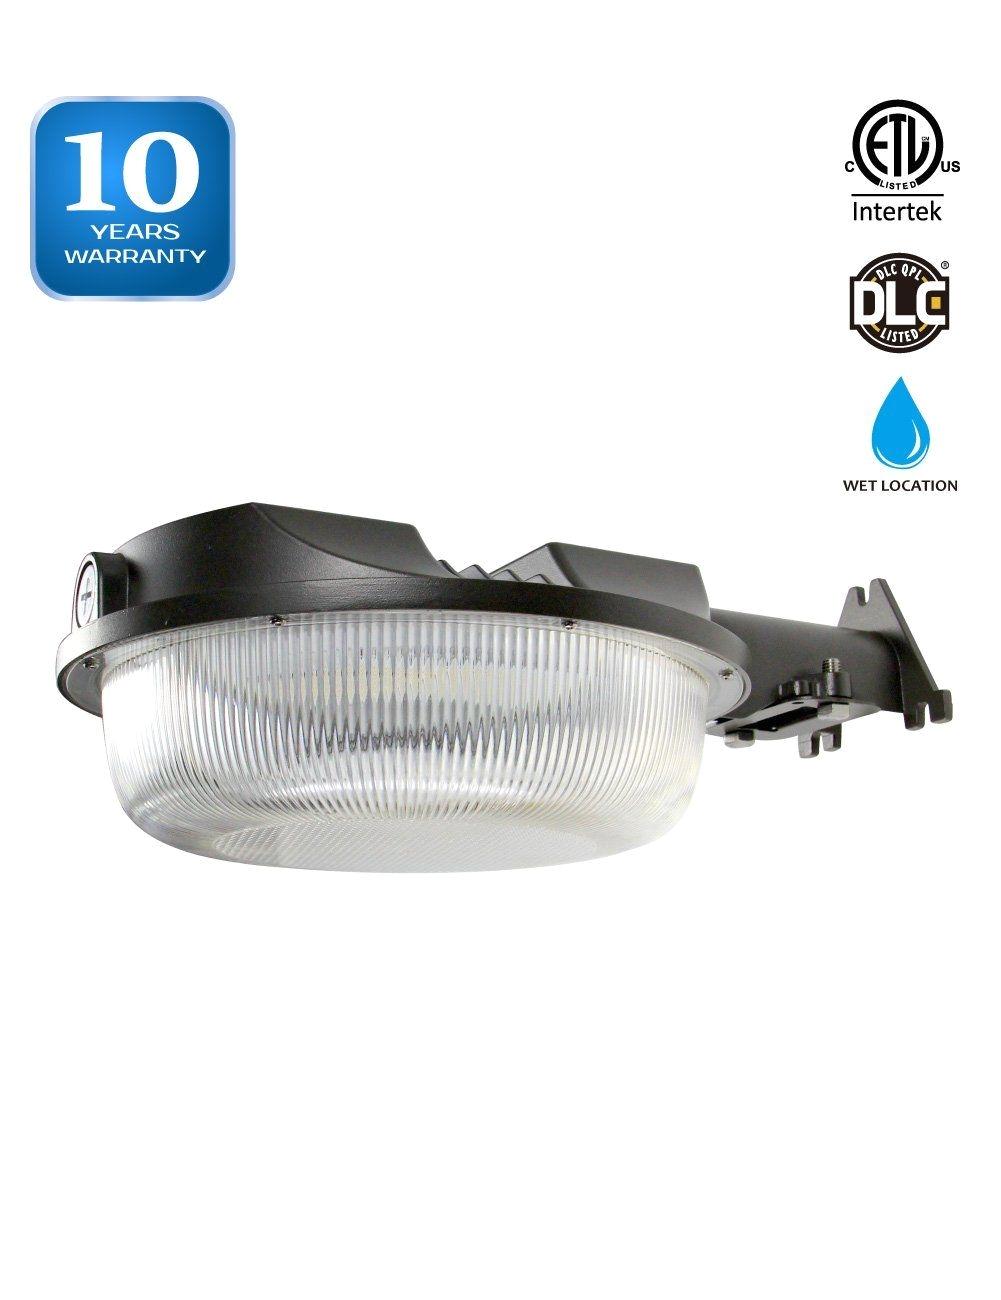 led barn light dusk to dawn photocell yard light for area lighting 58w 350w equiv